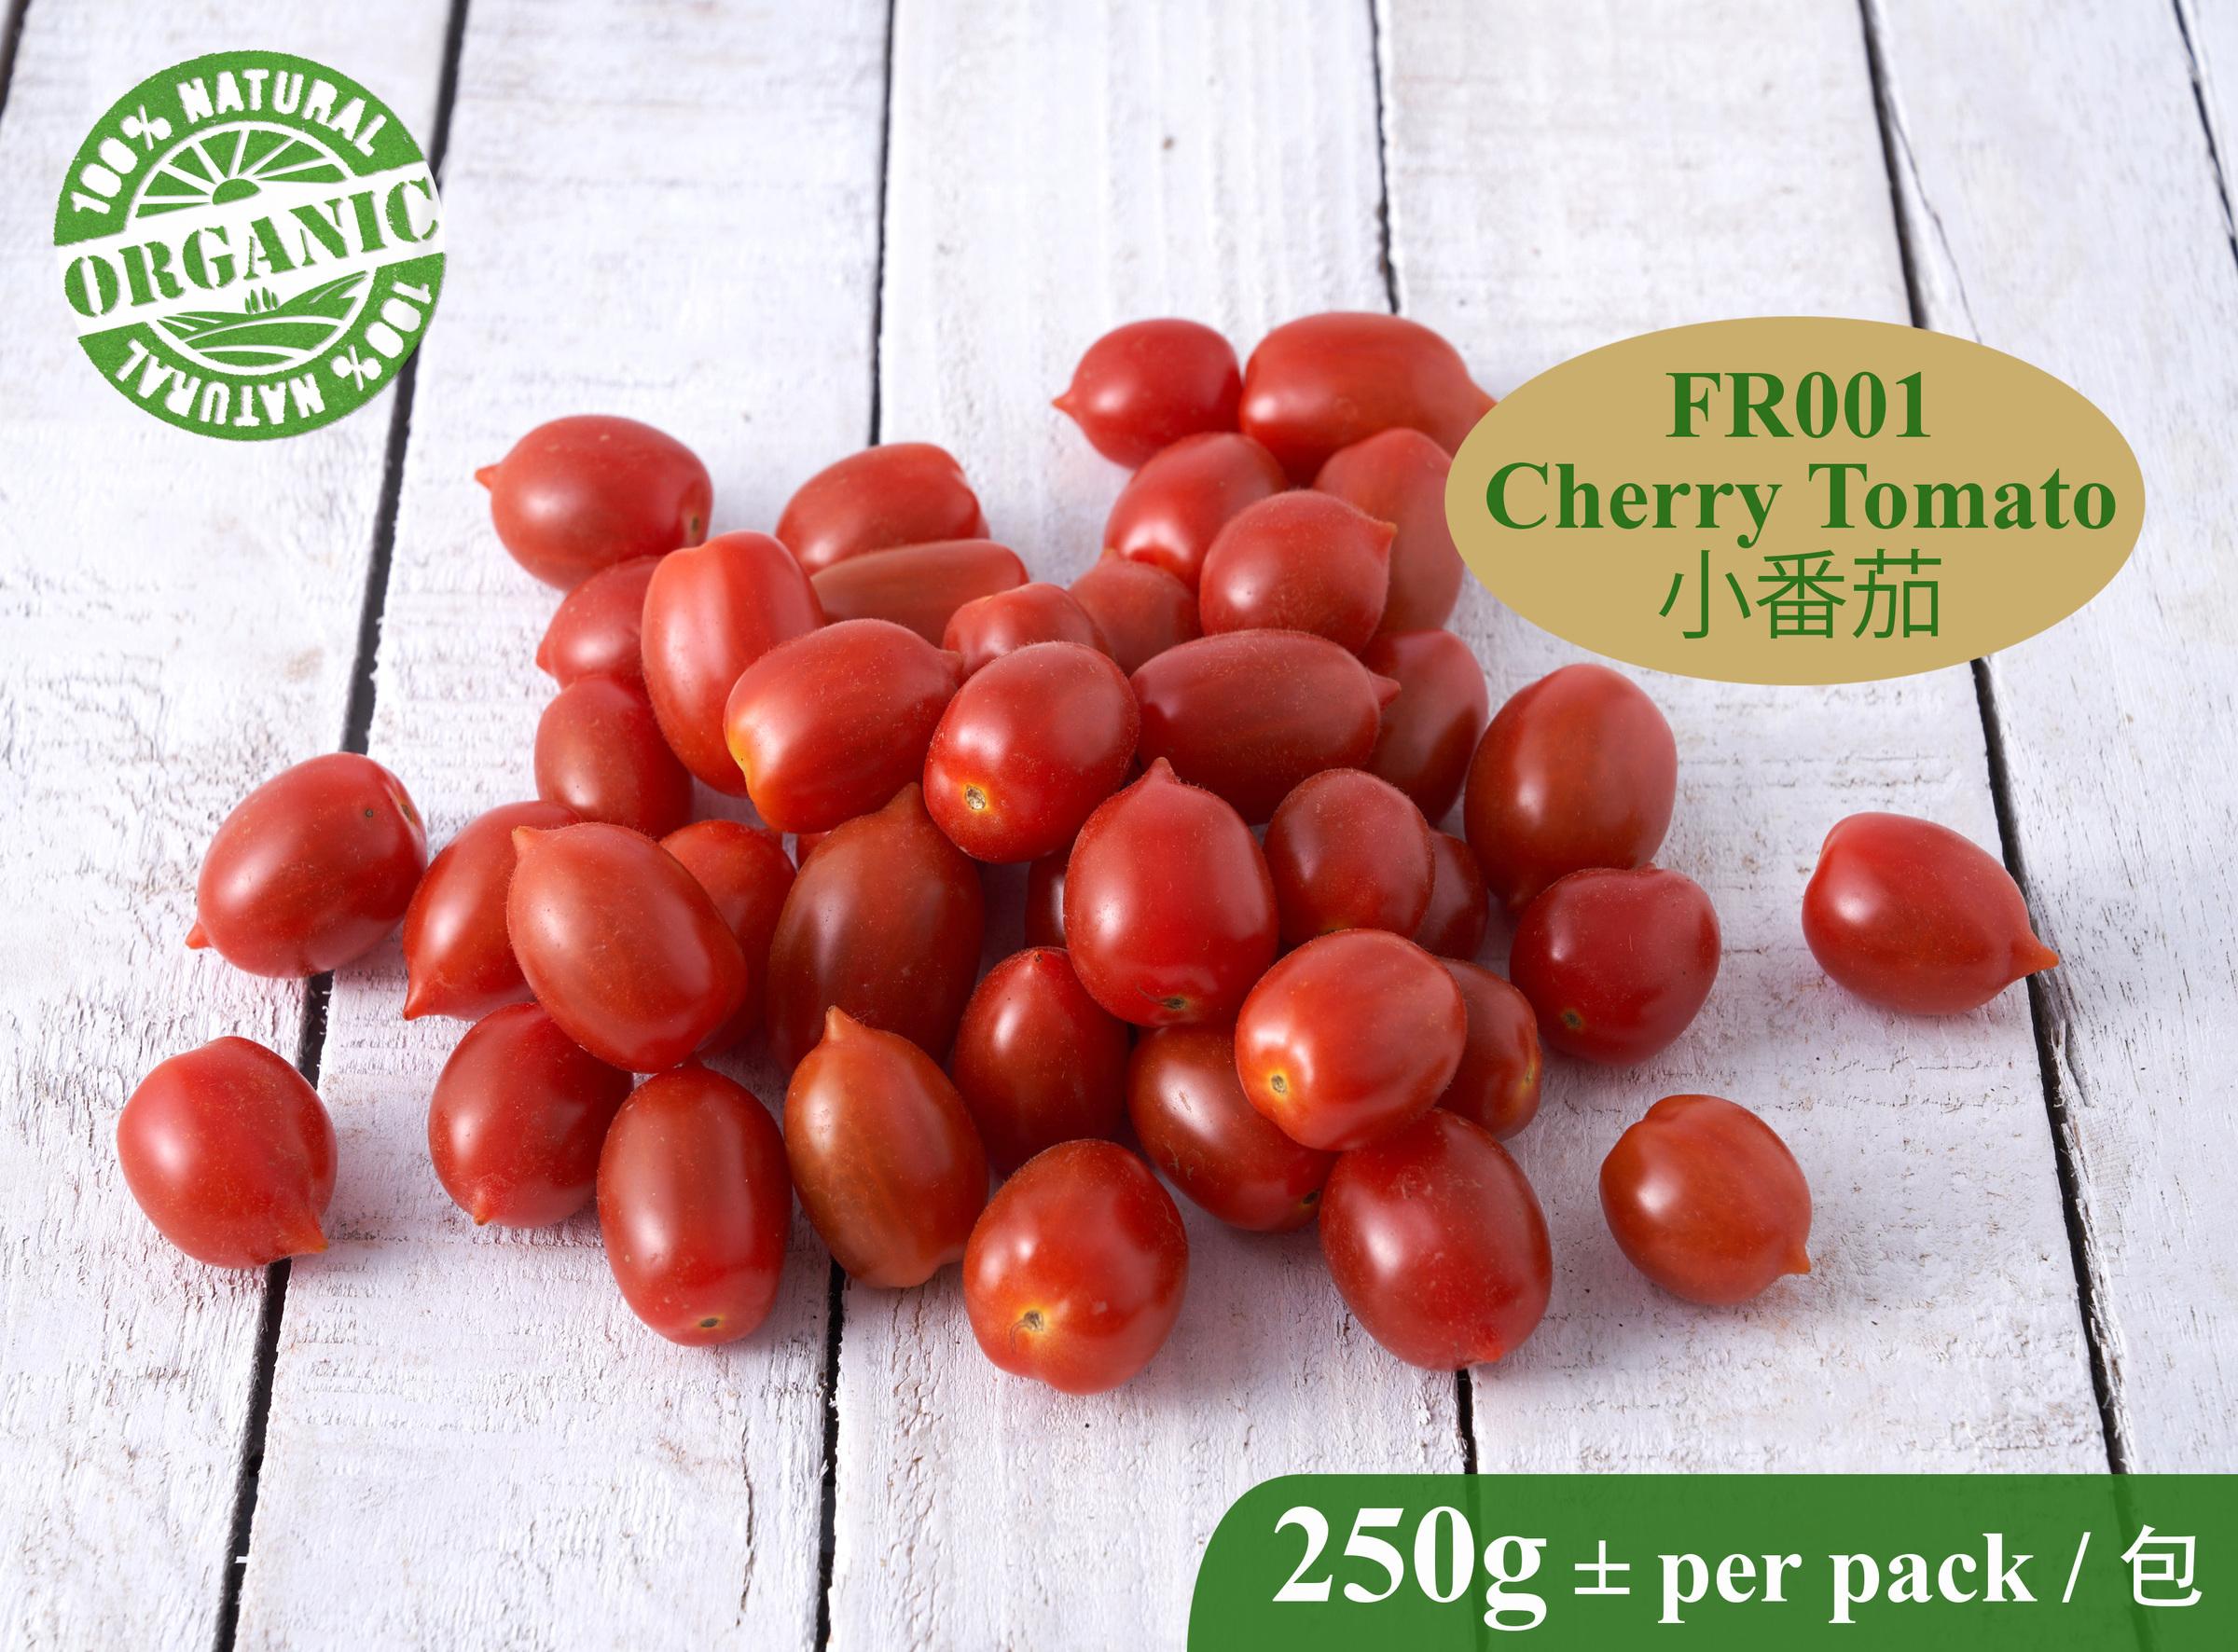 FR001 Cherry Tomato-RM5.70 per 250g+.jpg